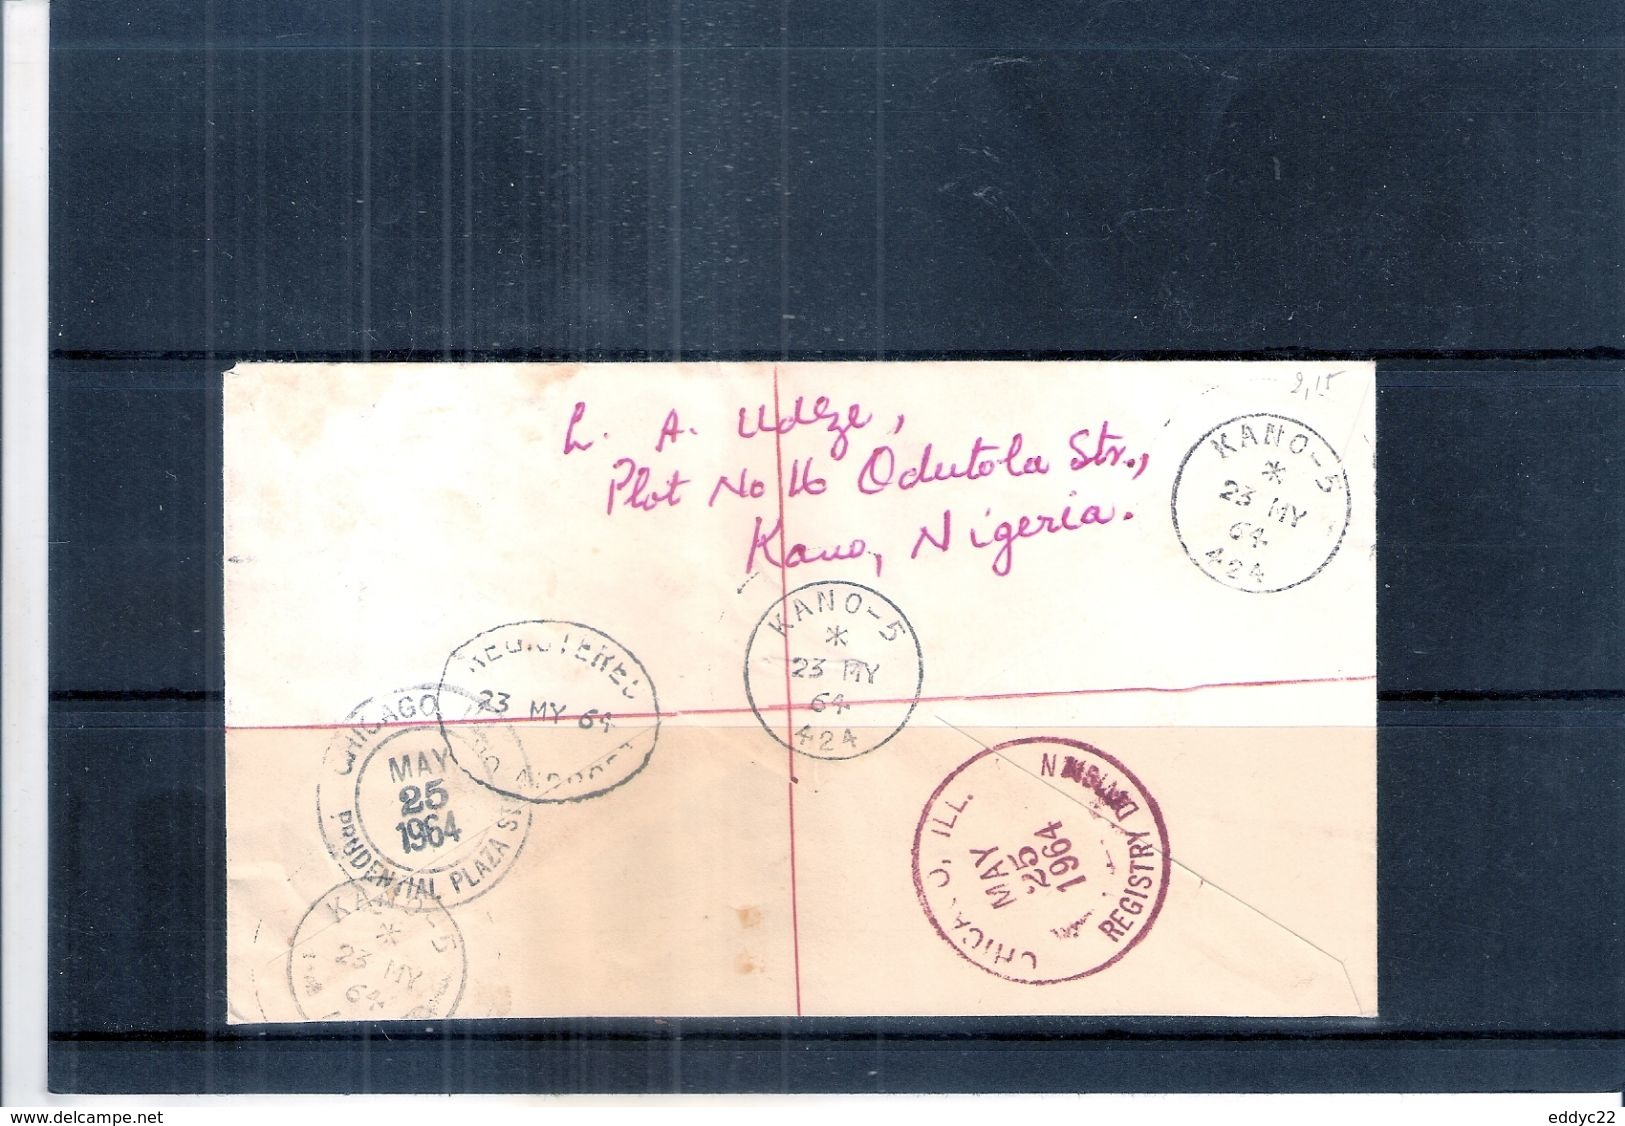 Lettre Recommandée Du Nigéria Vers U.S.A. - 1964 (à Voir Recto-verso) - Nigeria (1961-...)